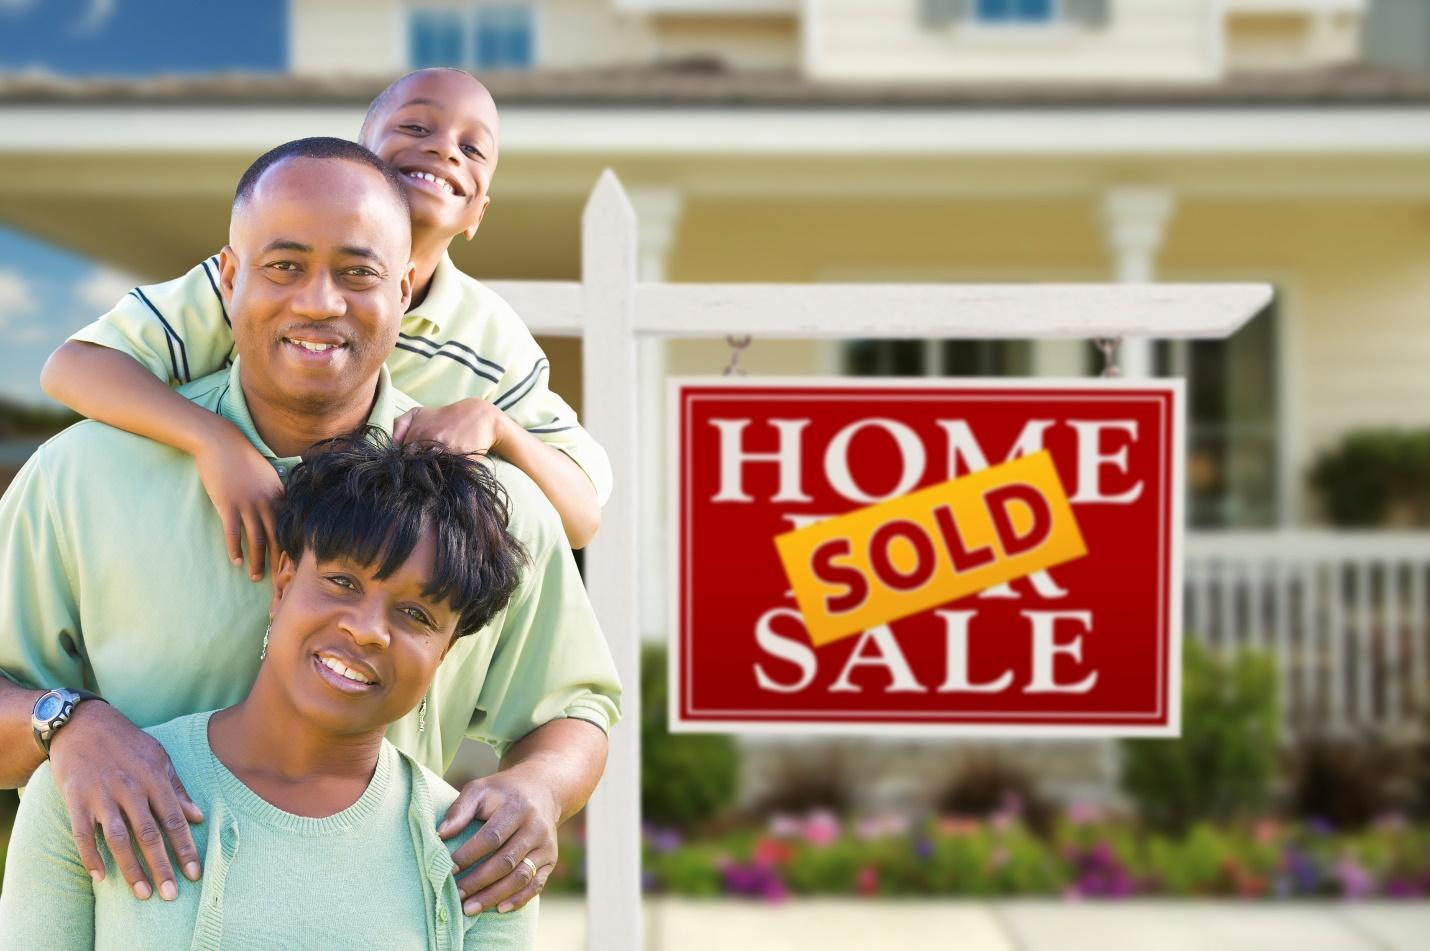 Home Sold1.jpg